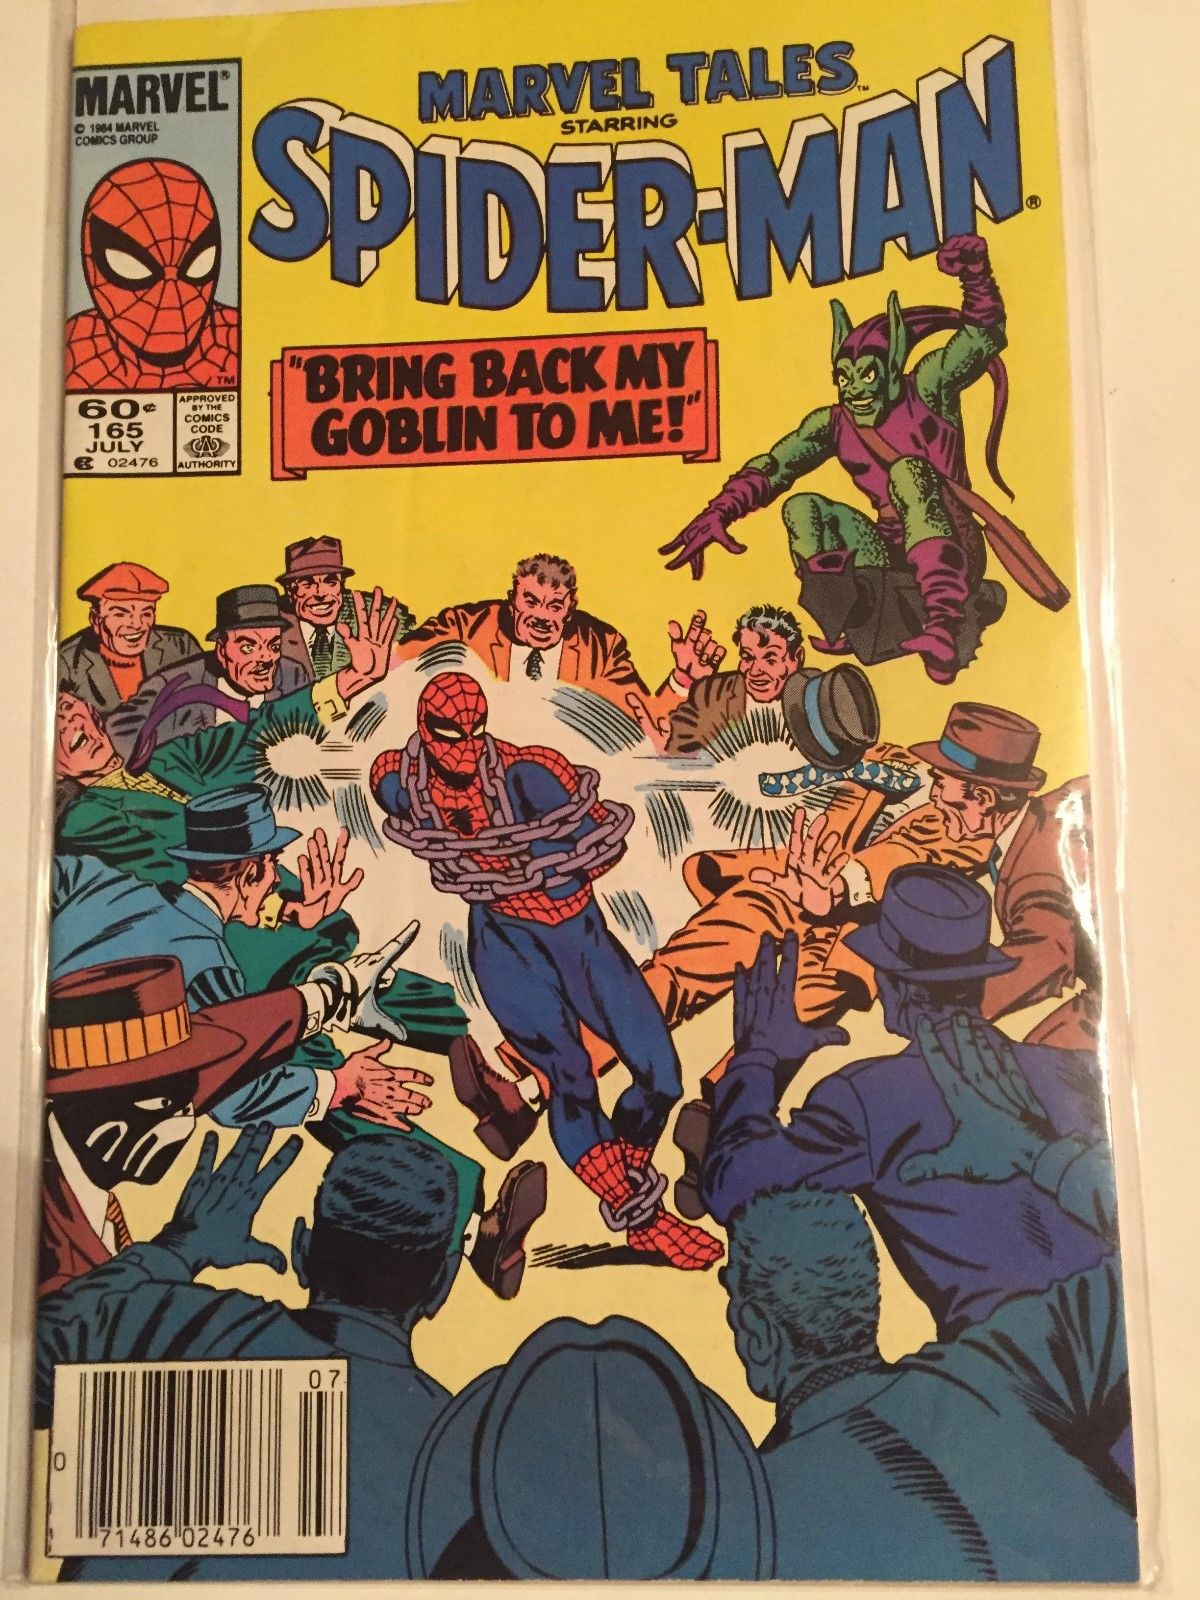 SPIDERMAN AMAZING #27 MARVEL COMICS JULY 2017 NM 9.4